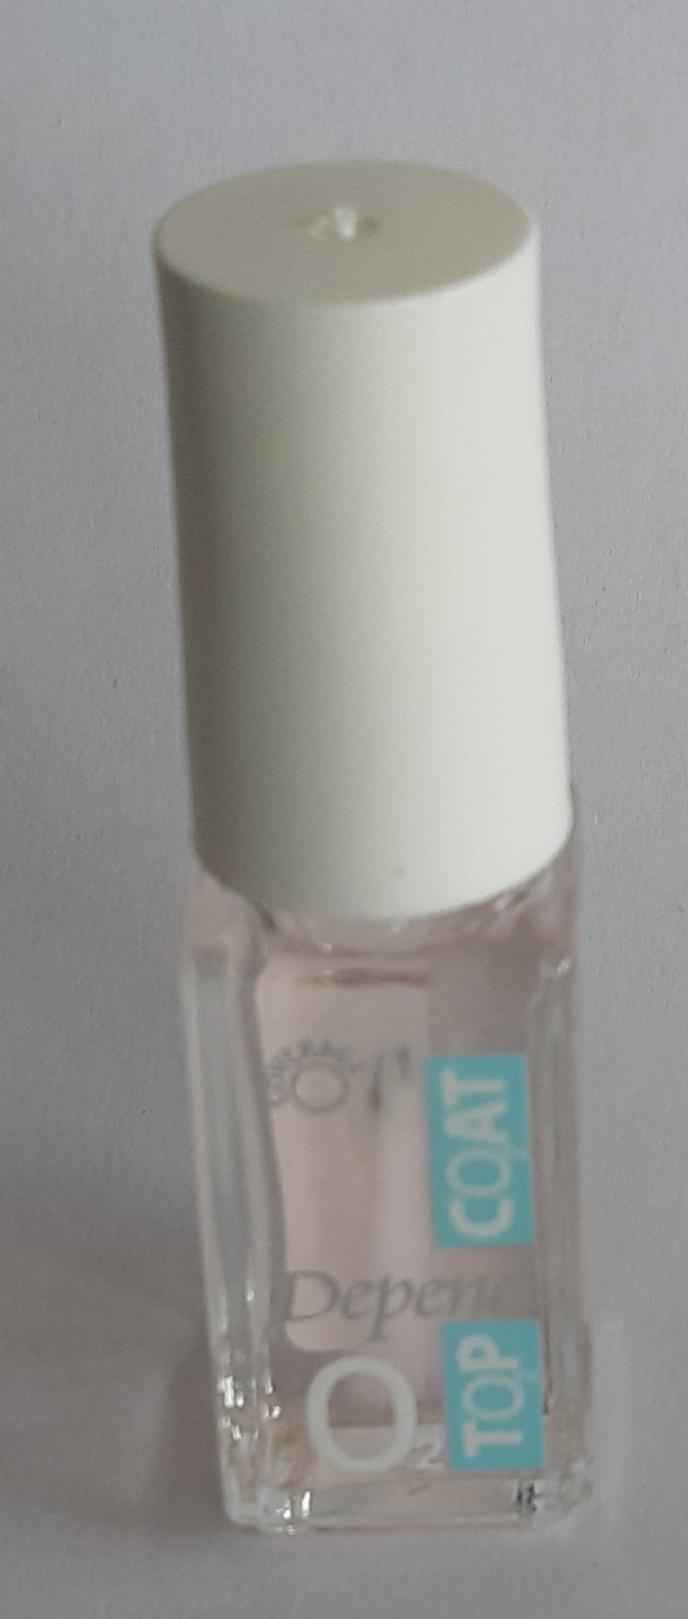 Mykored Anti-Voetschimmel en O2 Depend Nagellak Nagellak O2 Depend zuurstof doorlatend Topcoat